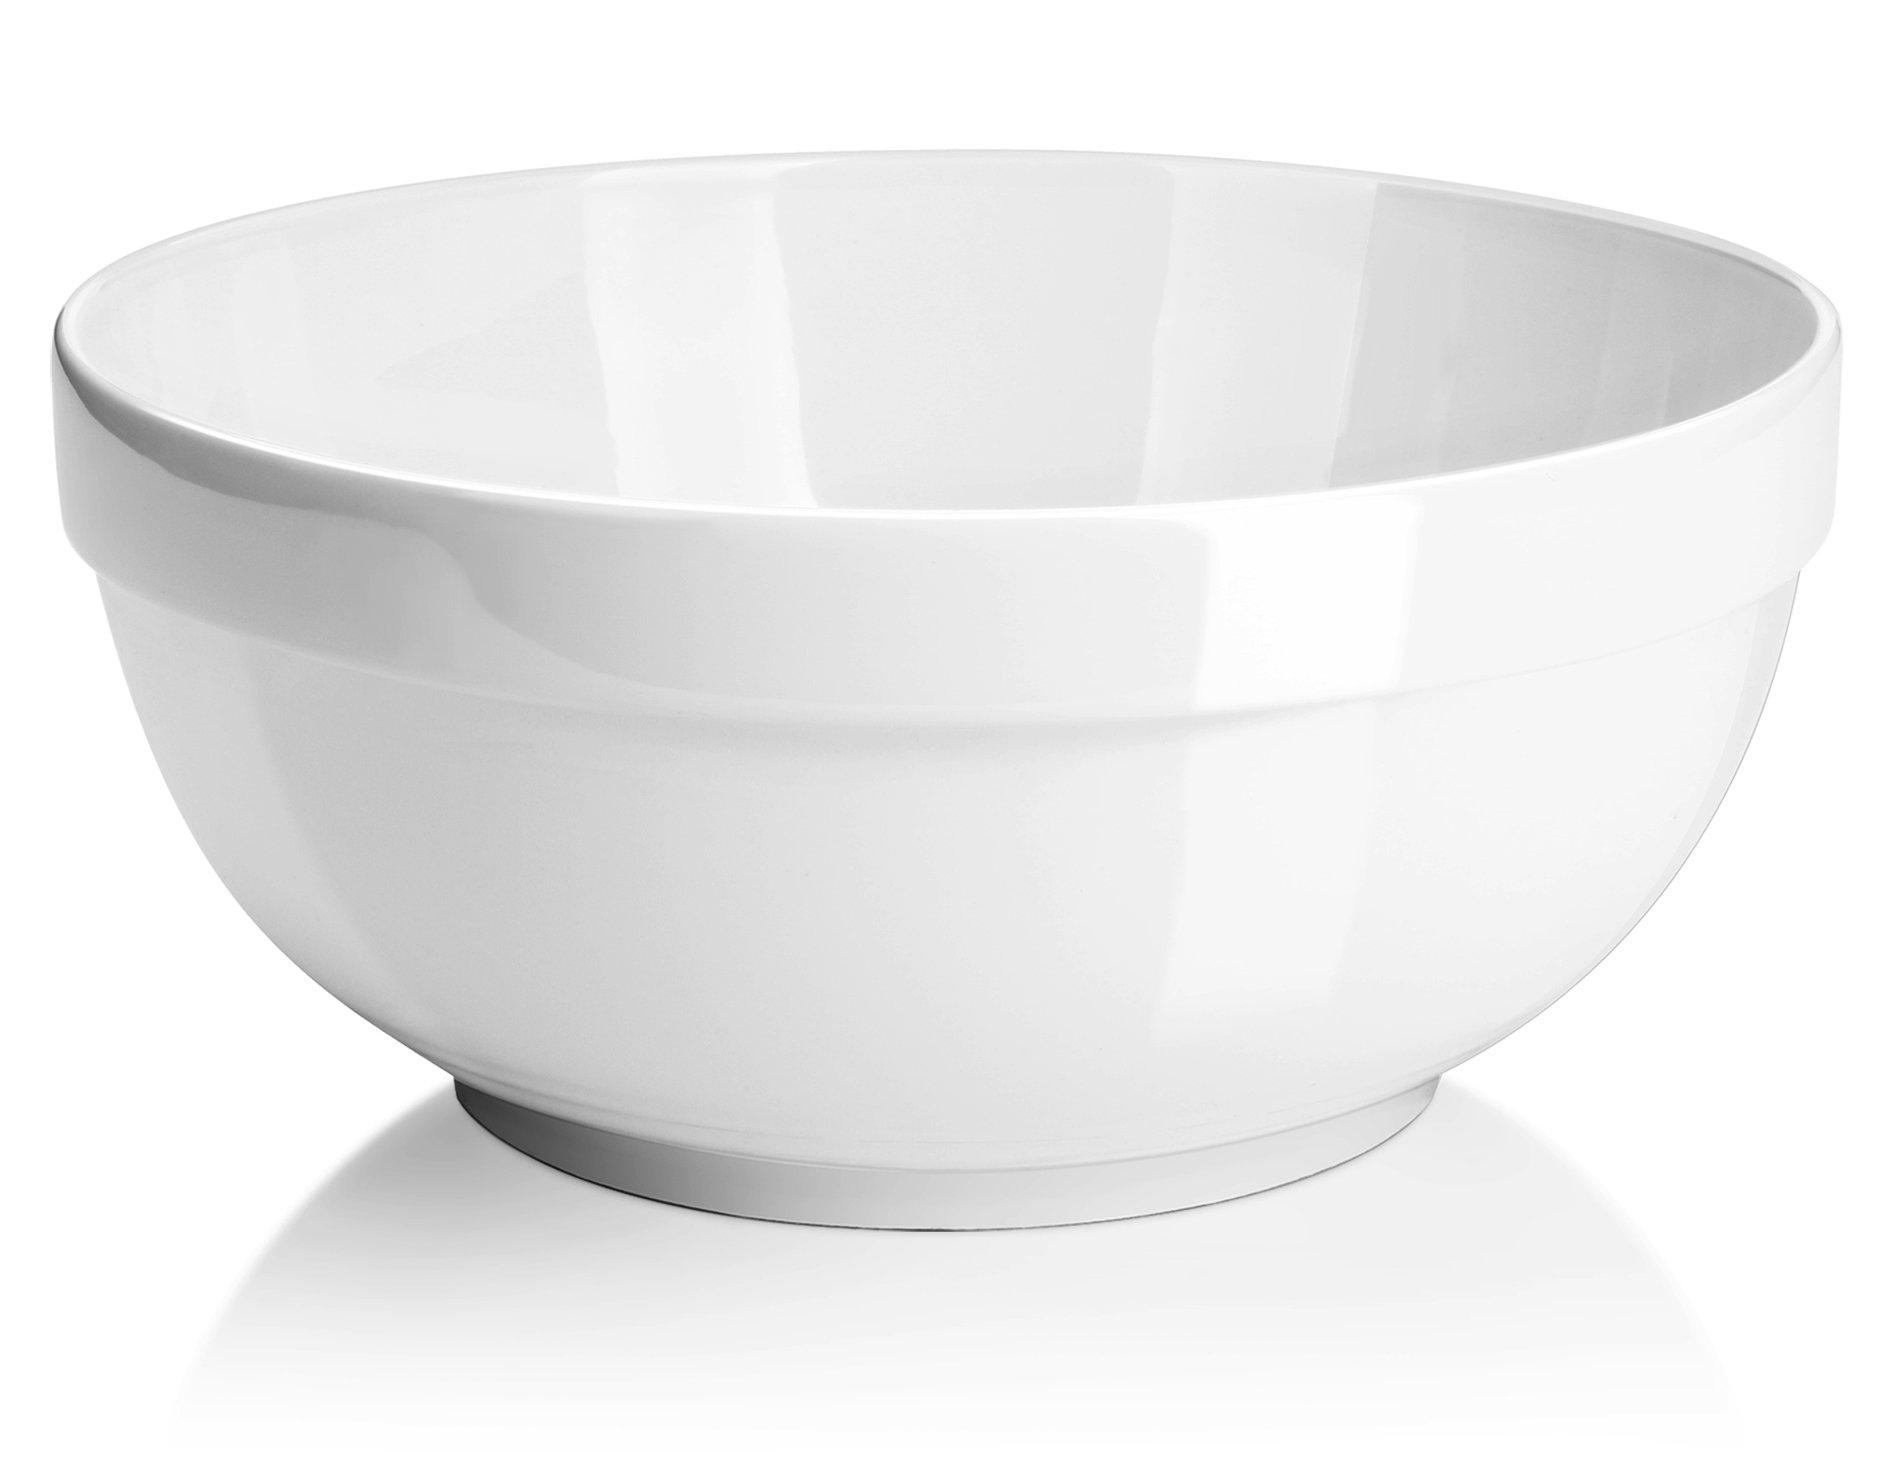 DOWAN 2 Quart Porcelain Serving Bowls - 2 Packs, White, Anti-slipping, Stackable